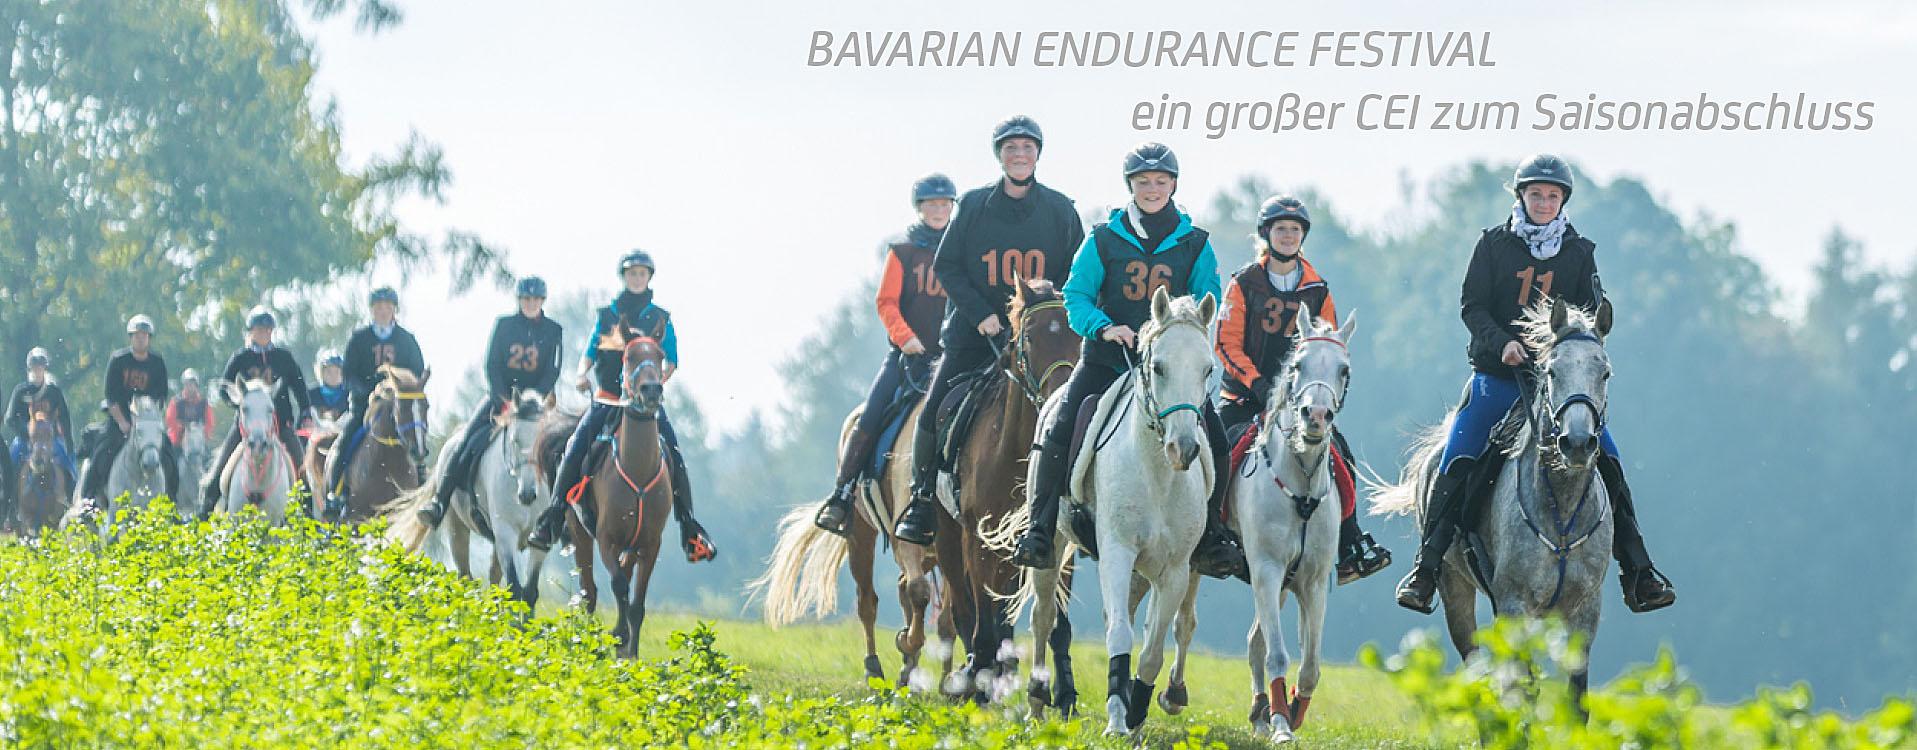 2. Babenhauser Distanz 2016, Foto: Jan Kirschnick